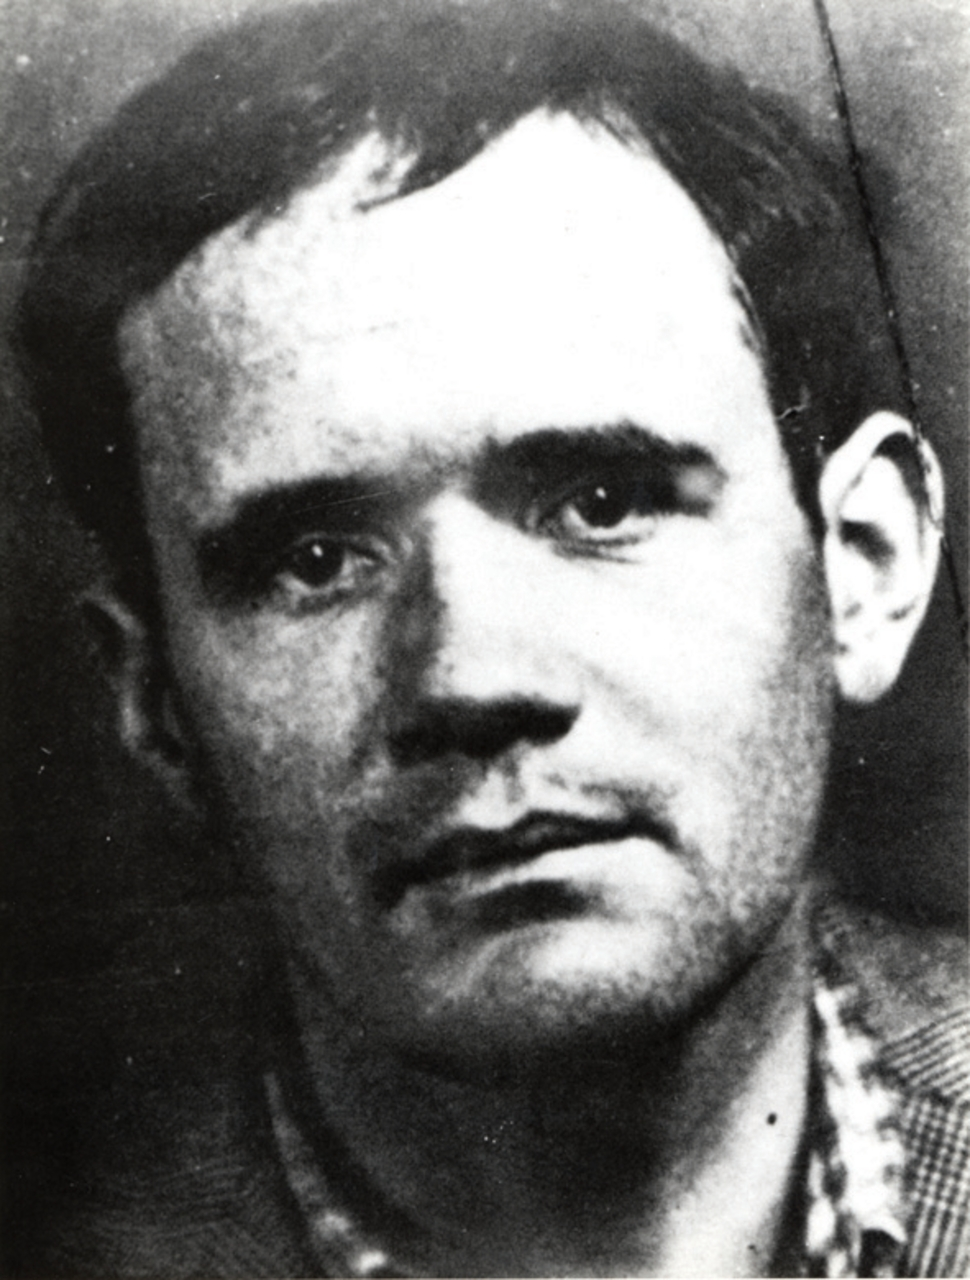 image for Genet, Jean (1910-1986)